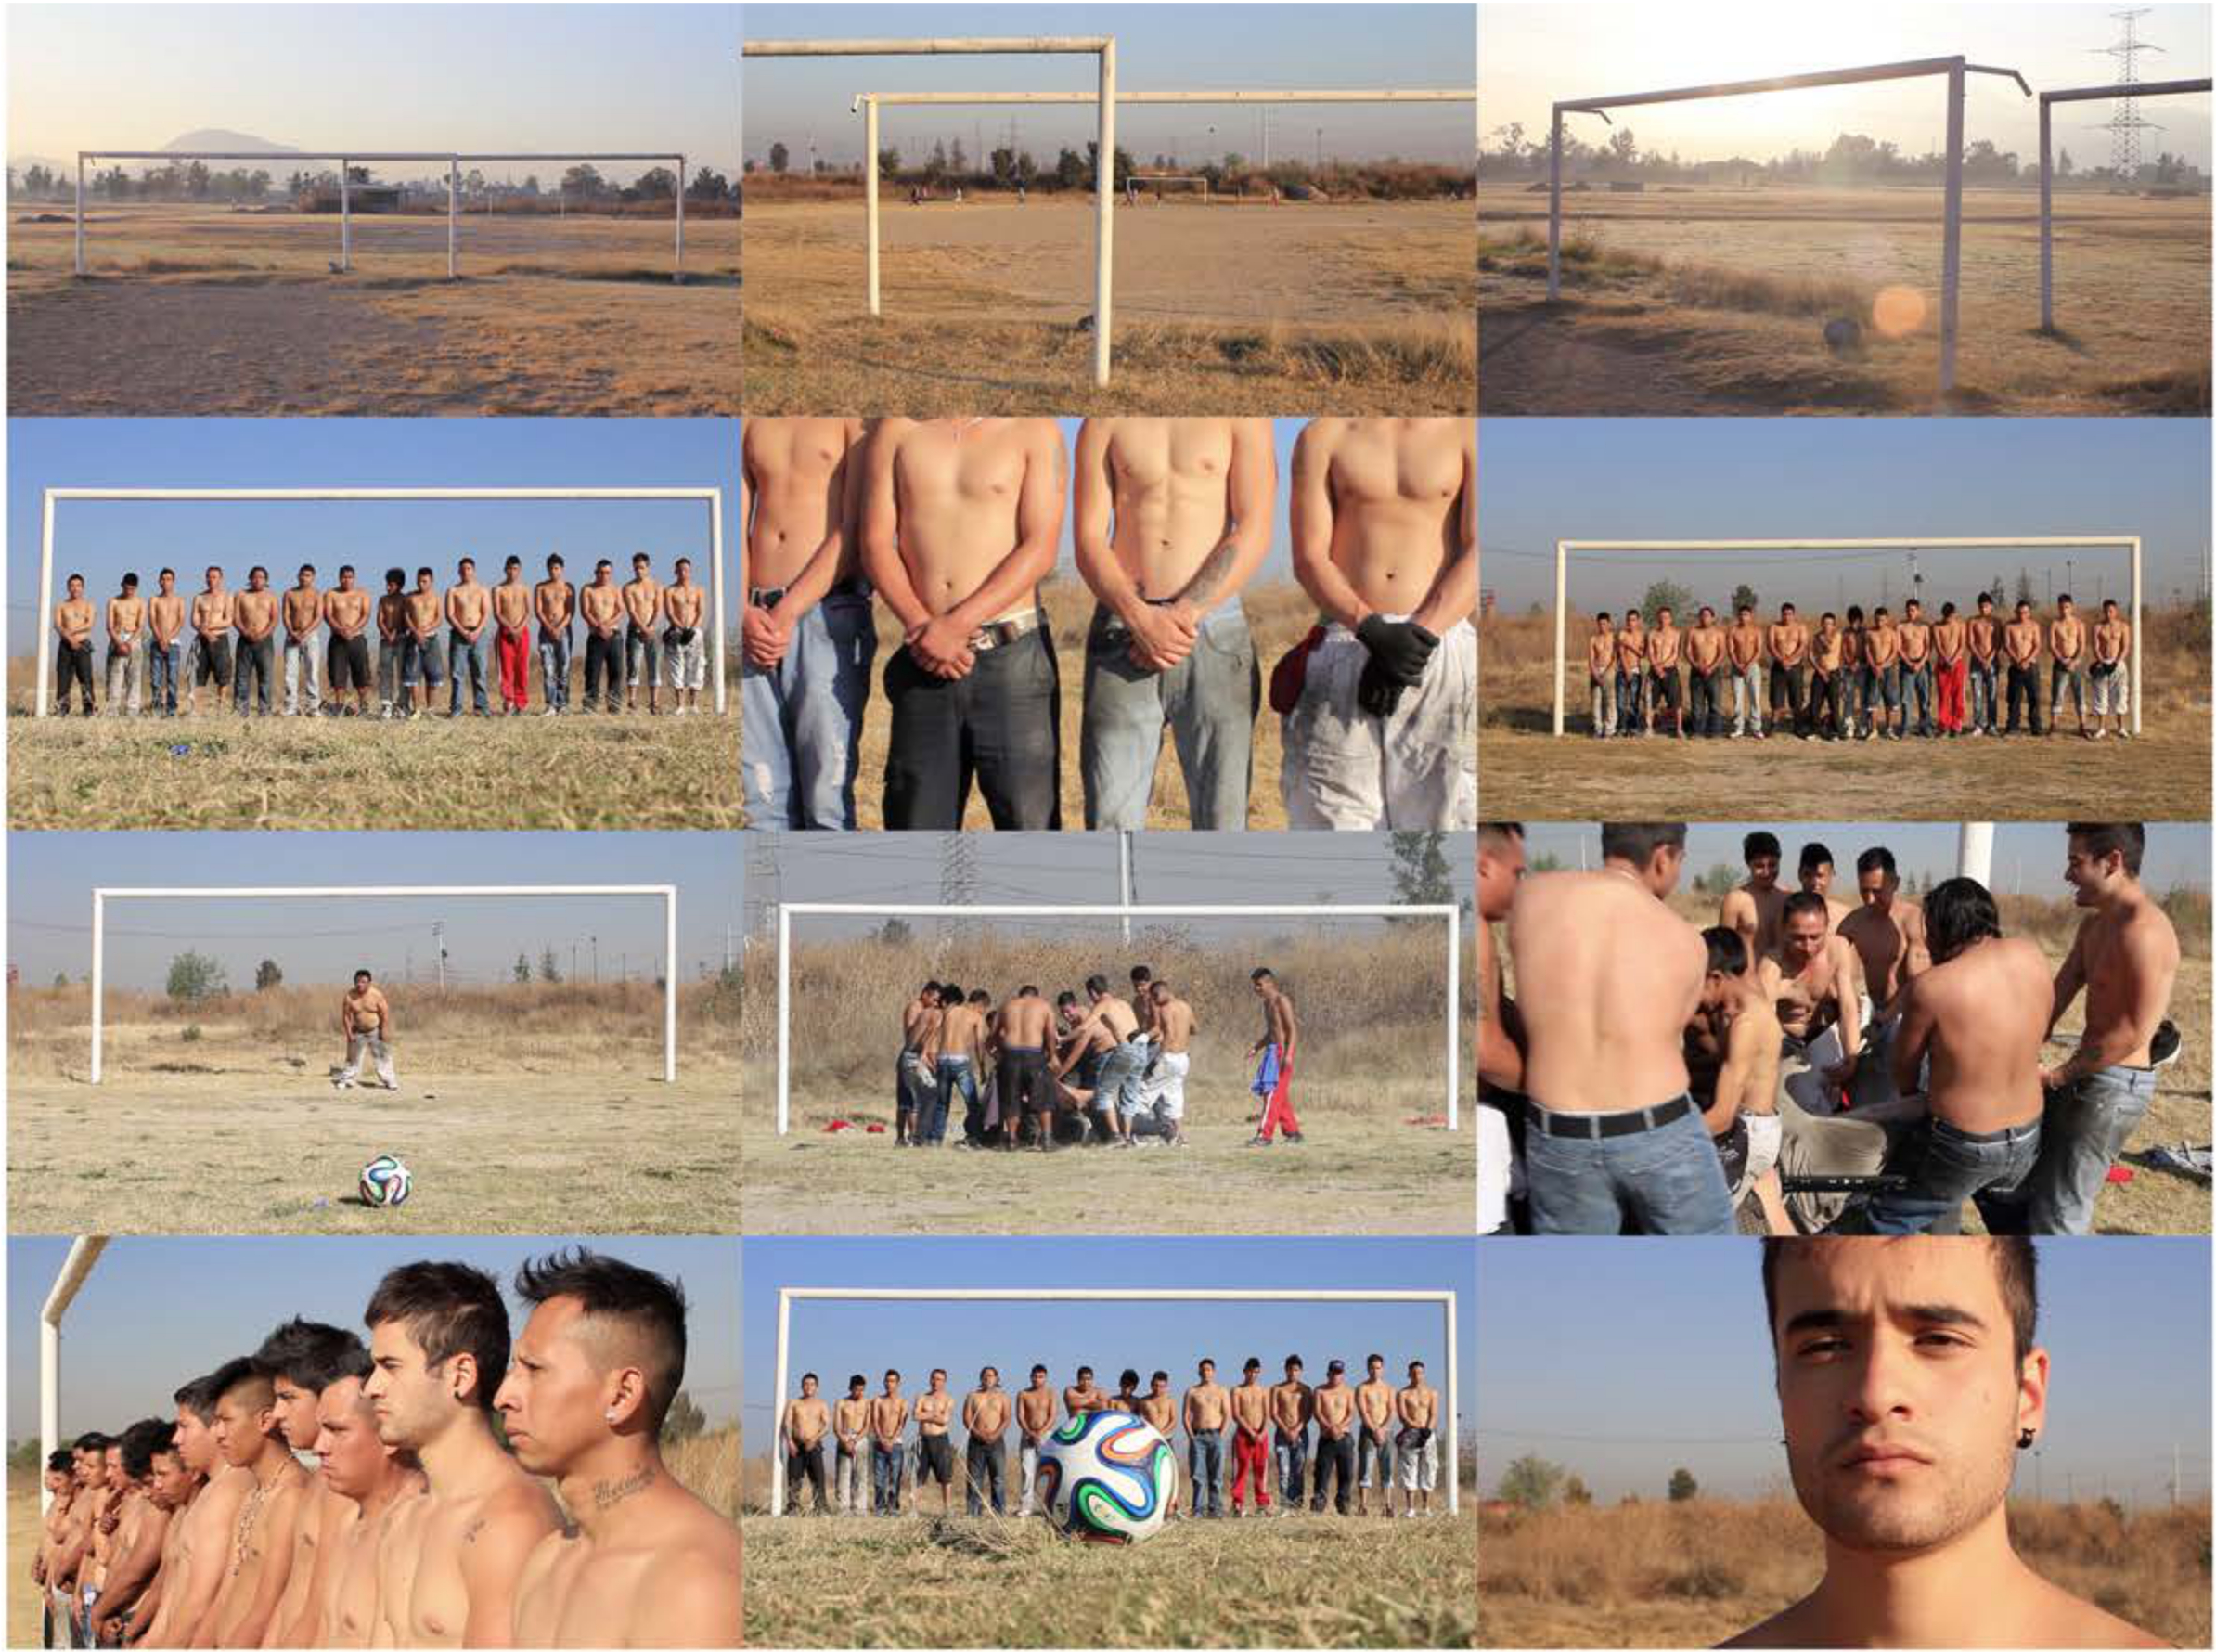 Política deportiva (Sports policy), 2014, Video